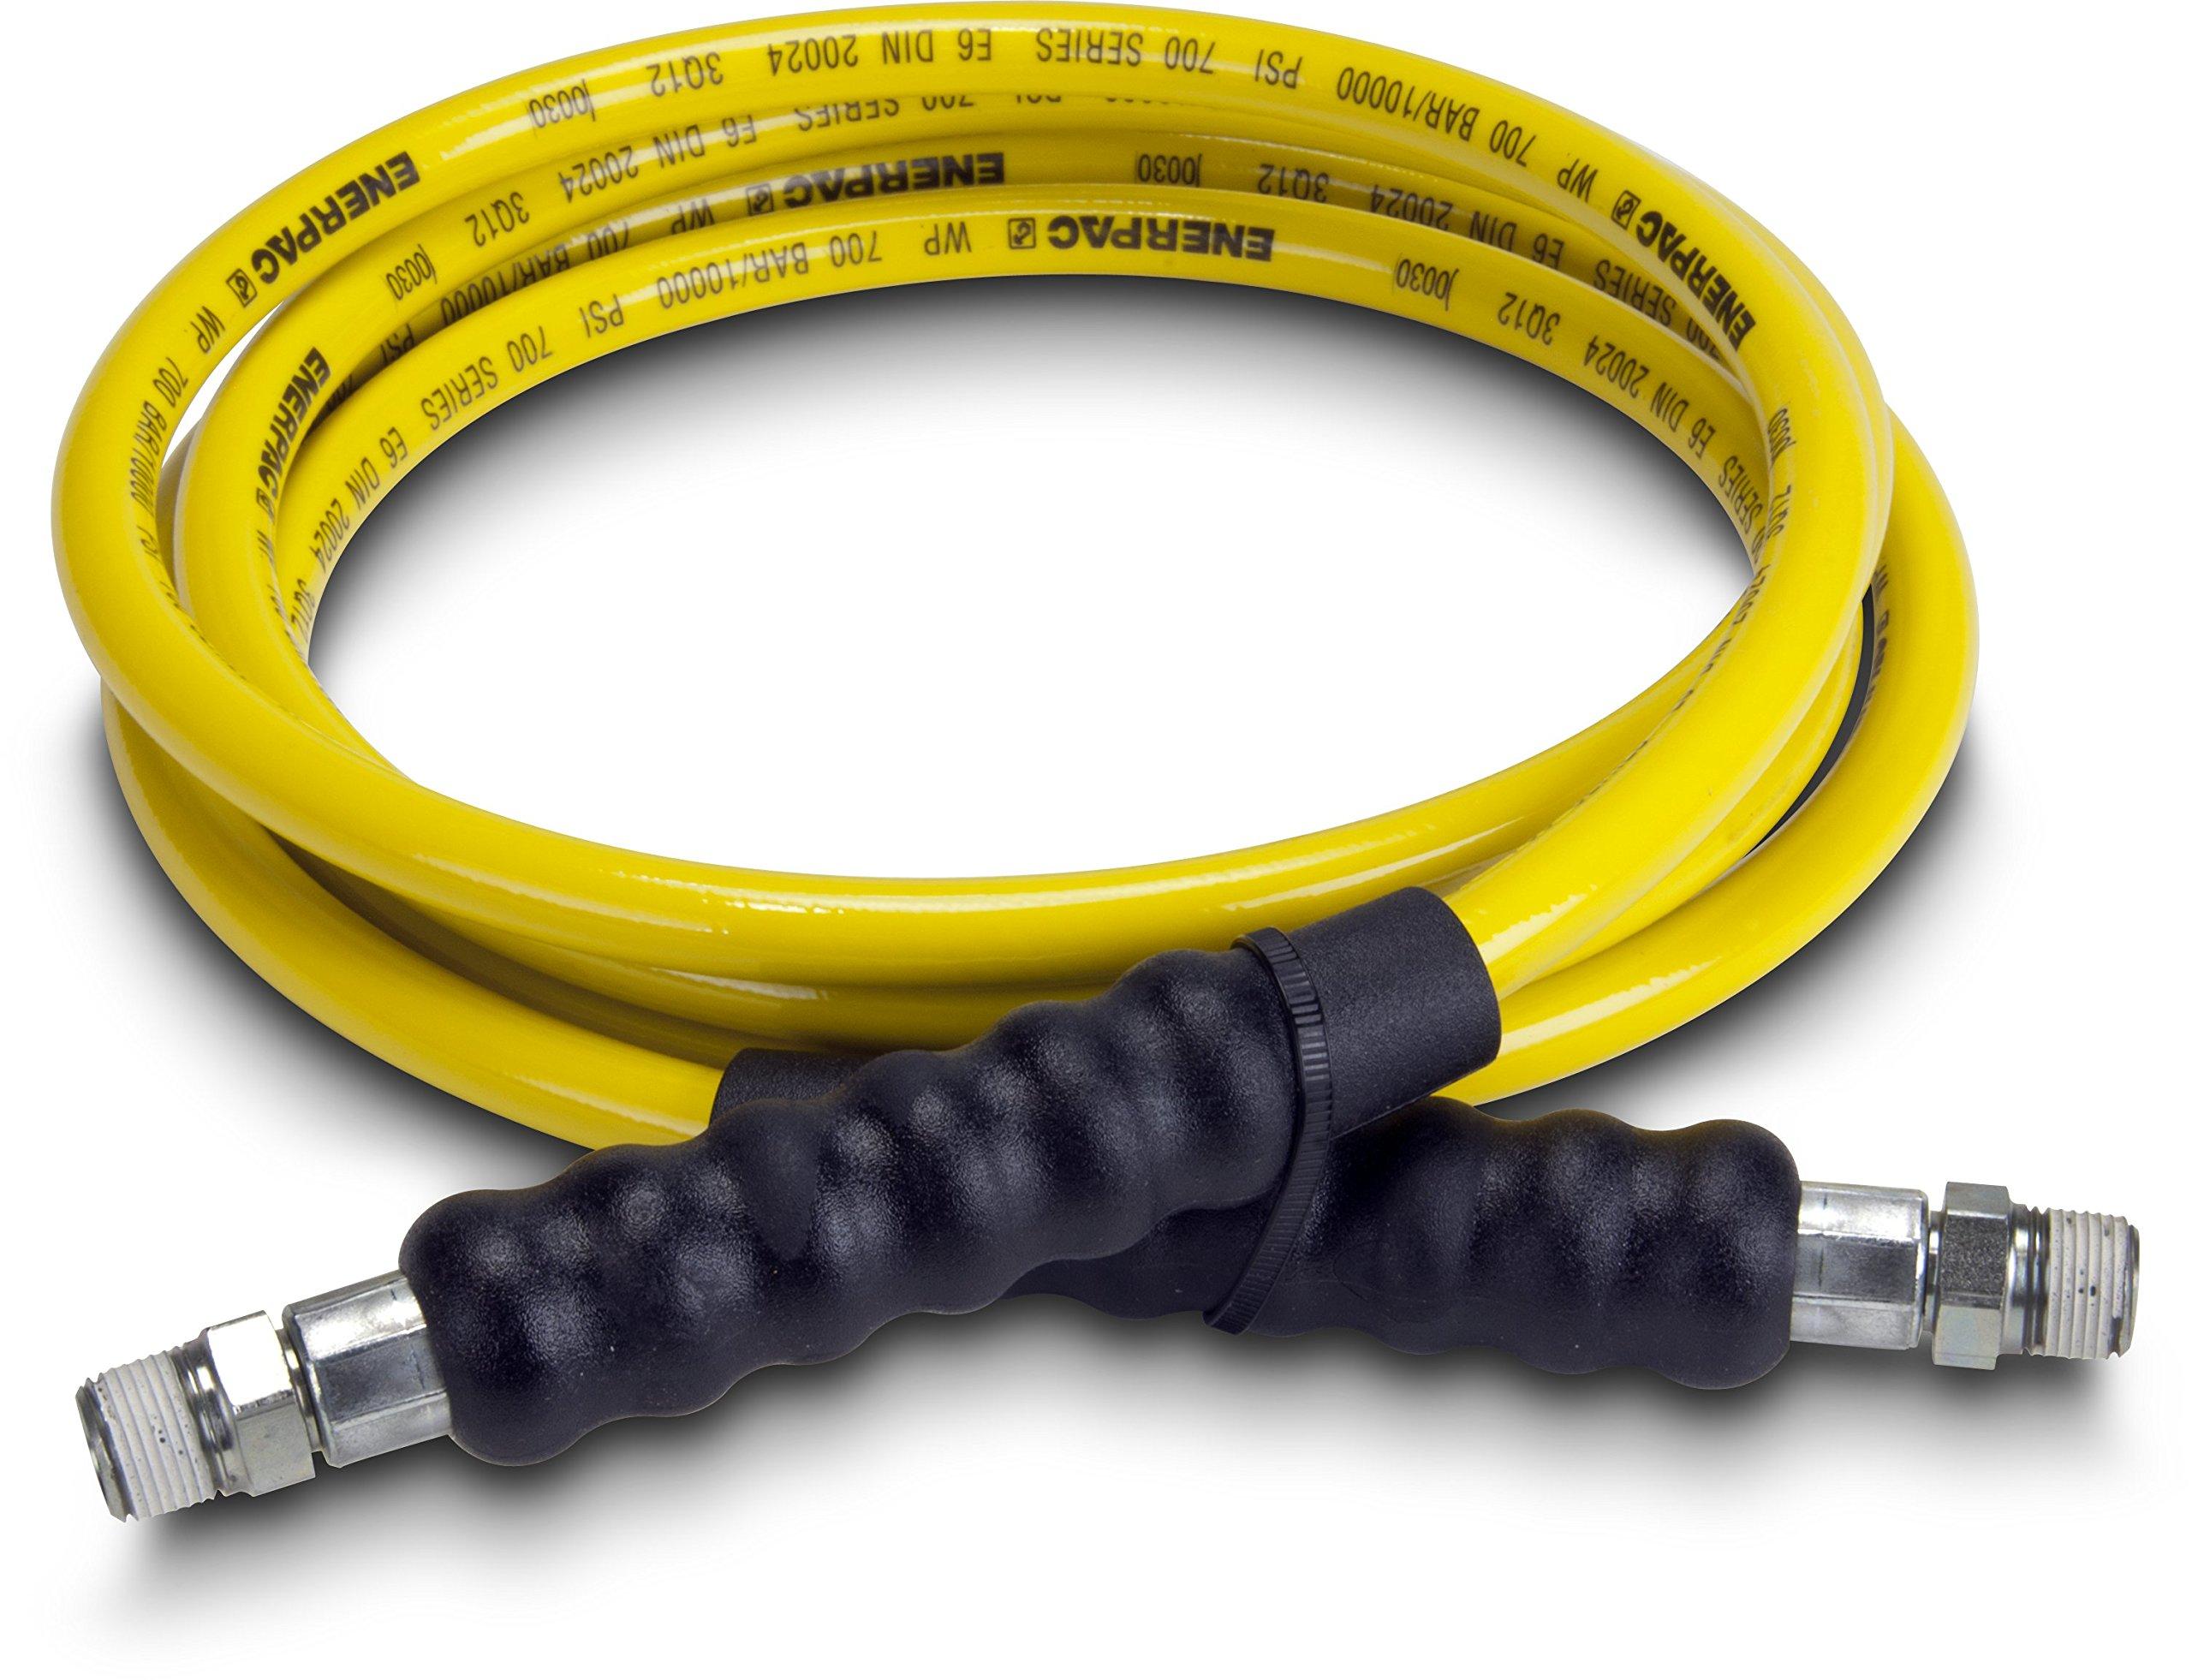 "Enerpac H7210 High Pressure Hydraulic Hose, 700 Series, 10' Length, 0.25"" Diameter, Yellow"